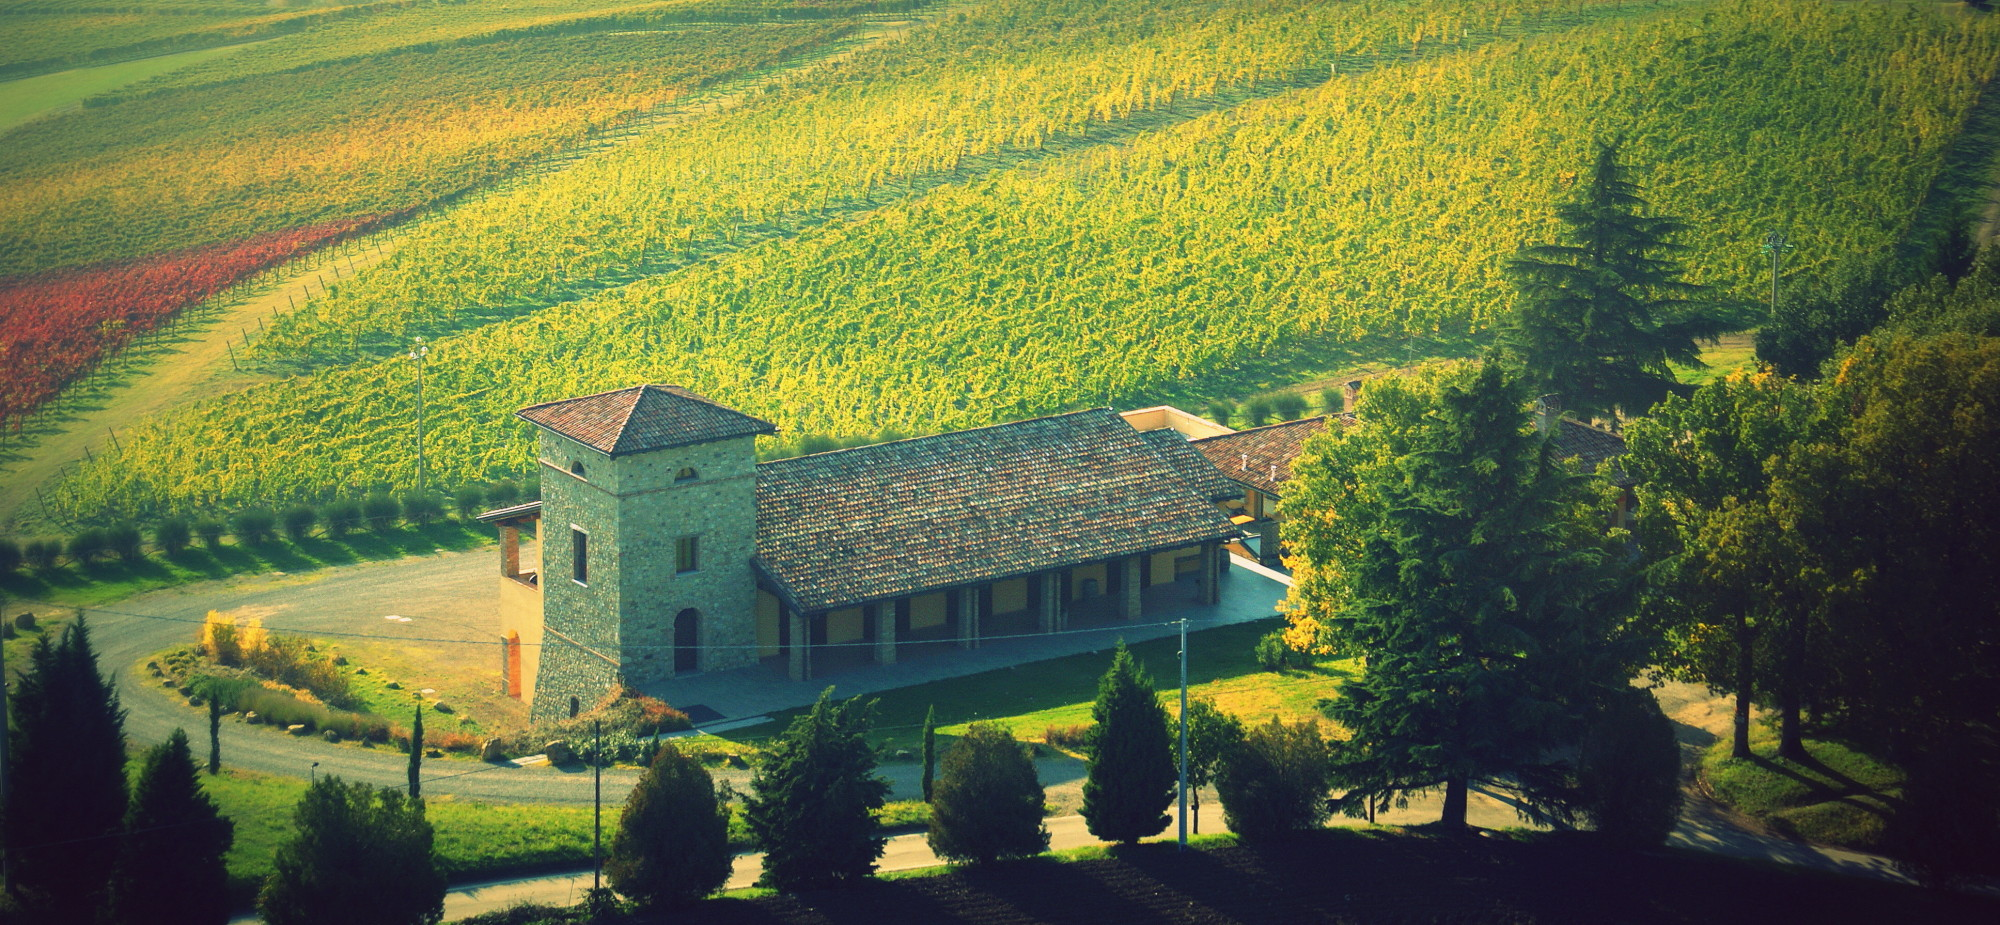 tenuta-bonzara-location-bologna